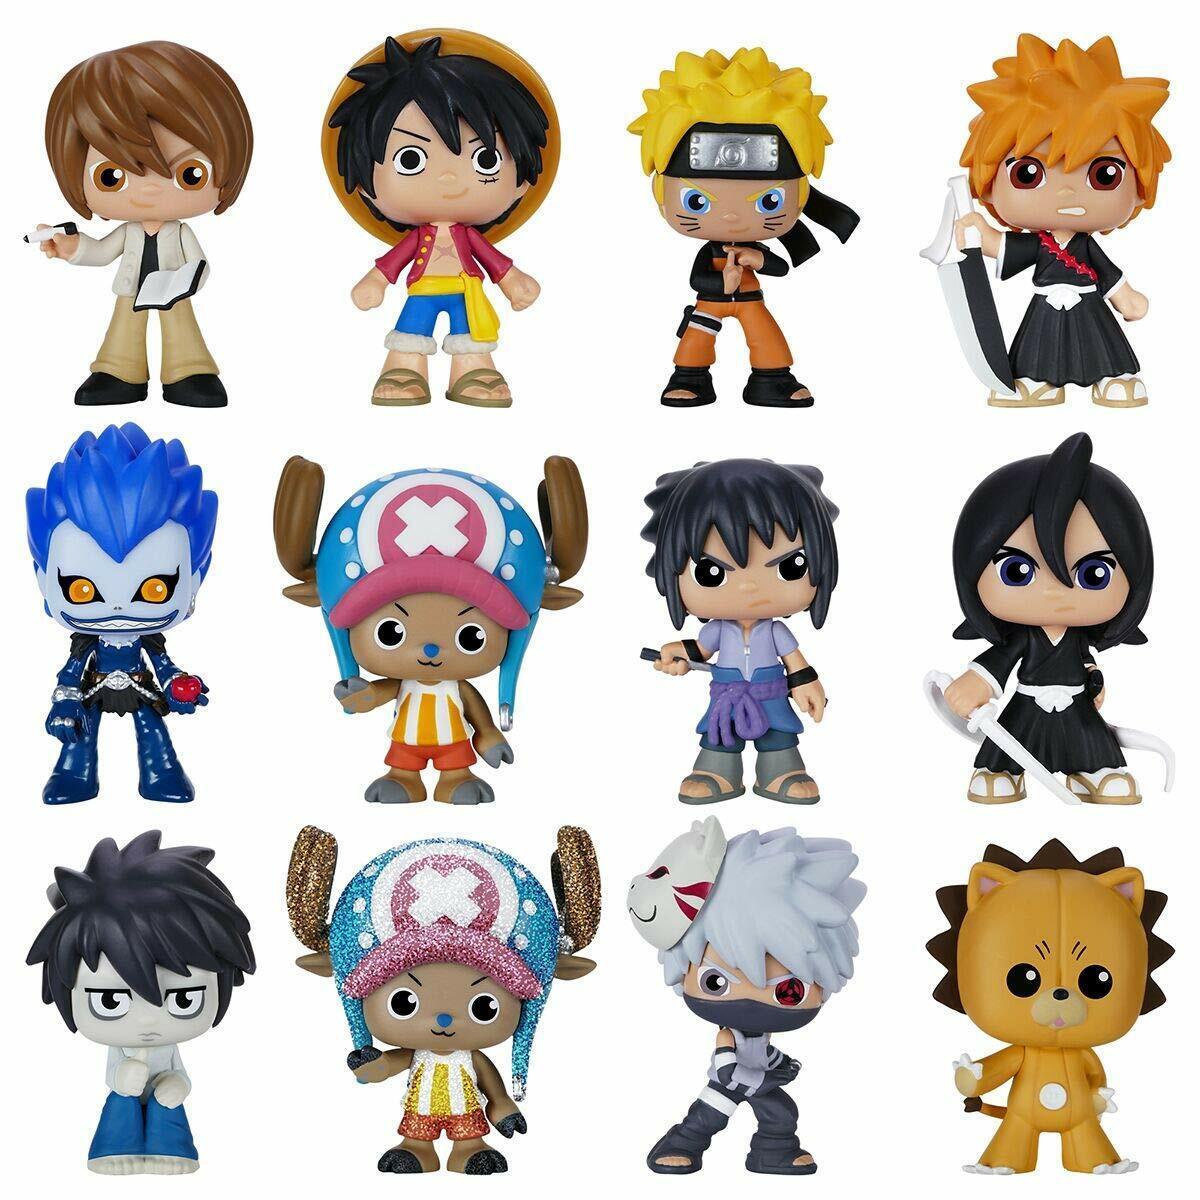 Diverdeimentoko Mystery Minis Shonen Jump Best of Anime  Pezzi Singoli Seleziona  protezione post-vendita